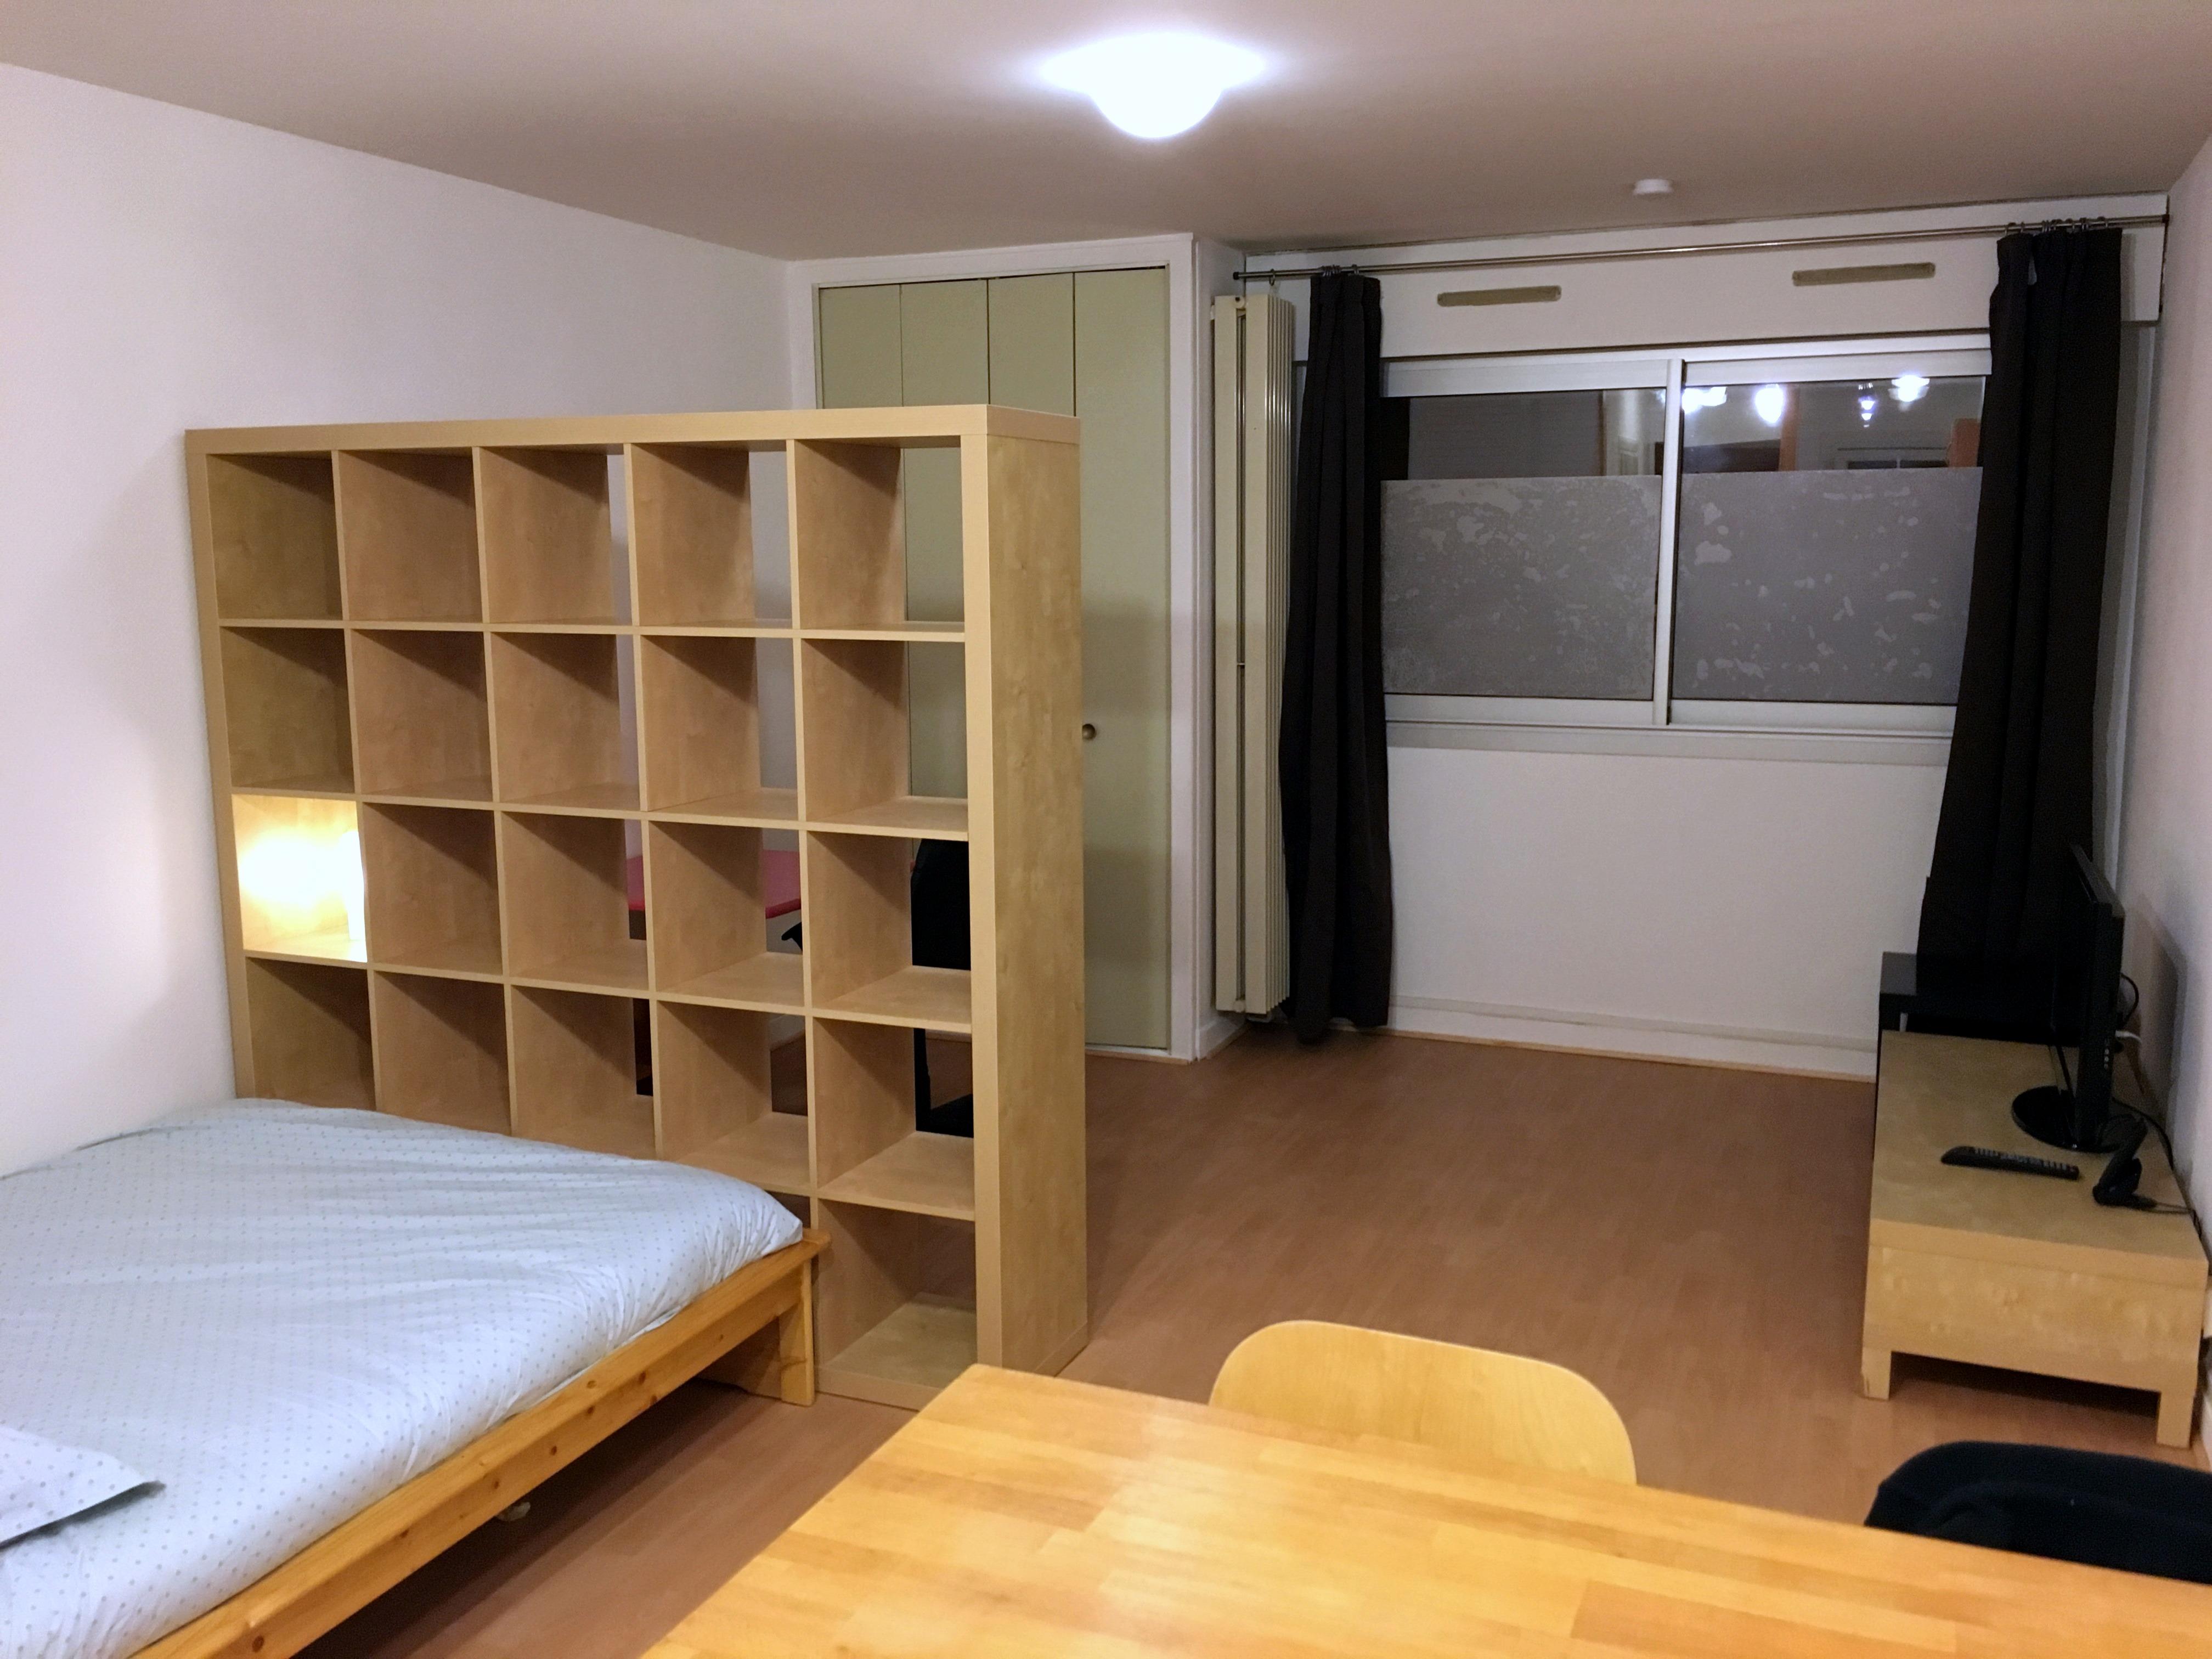 Location studio meubl boulogne billancourt 92100 - Meubles boulogne billancourt ...